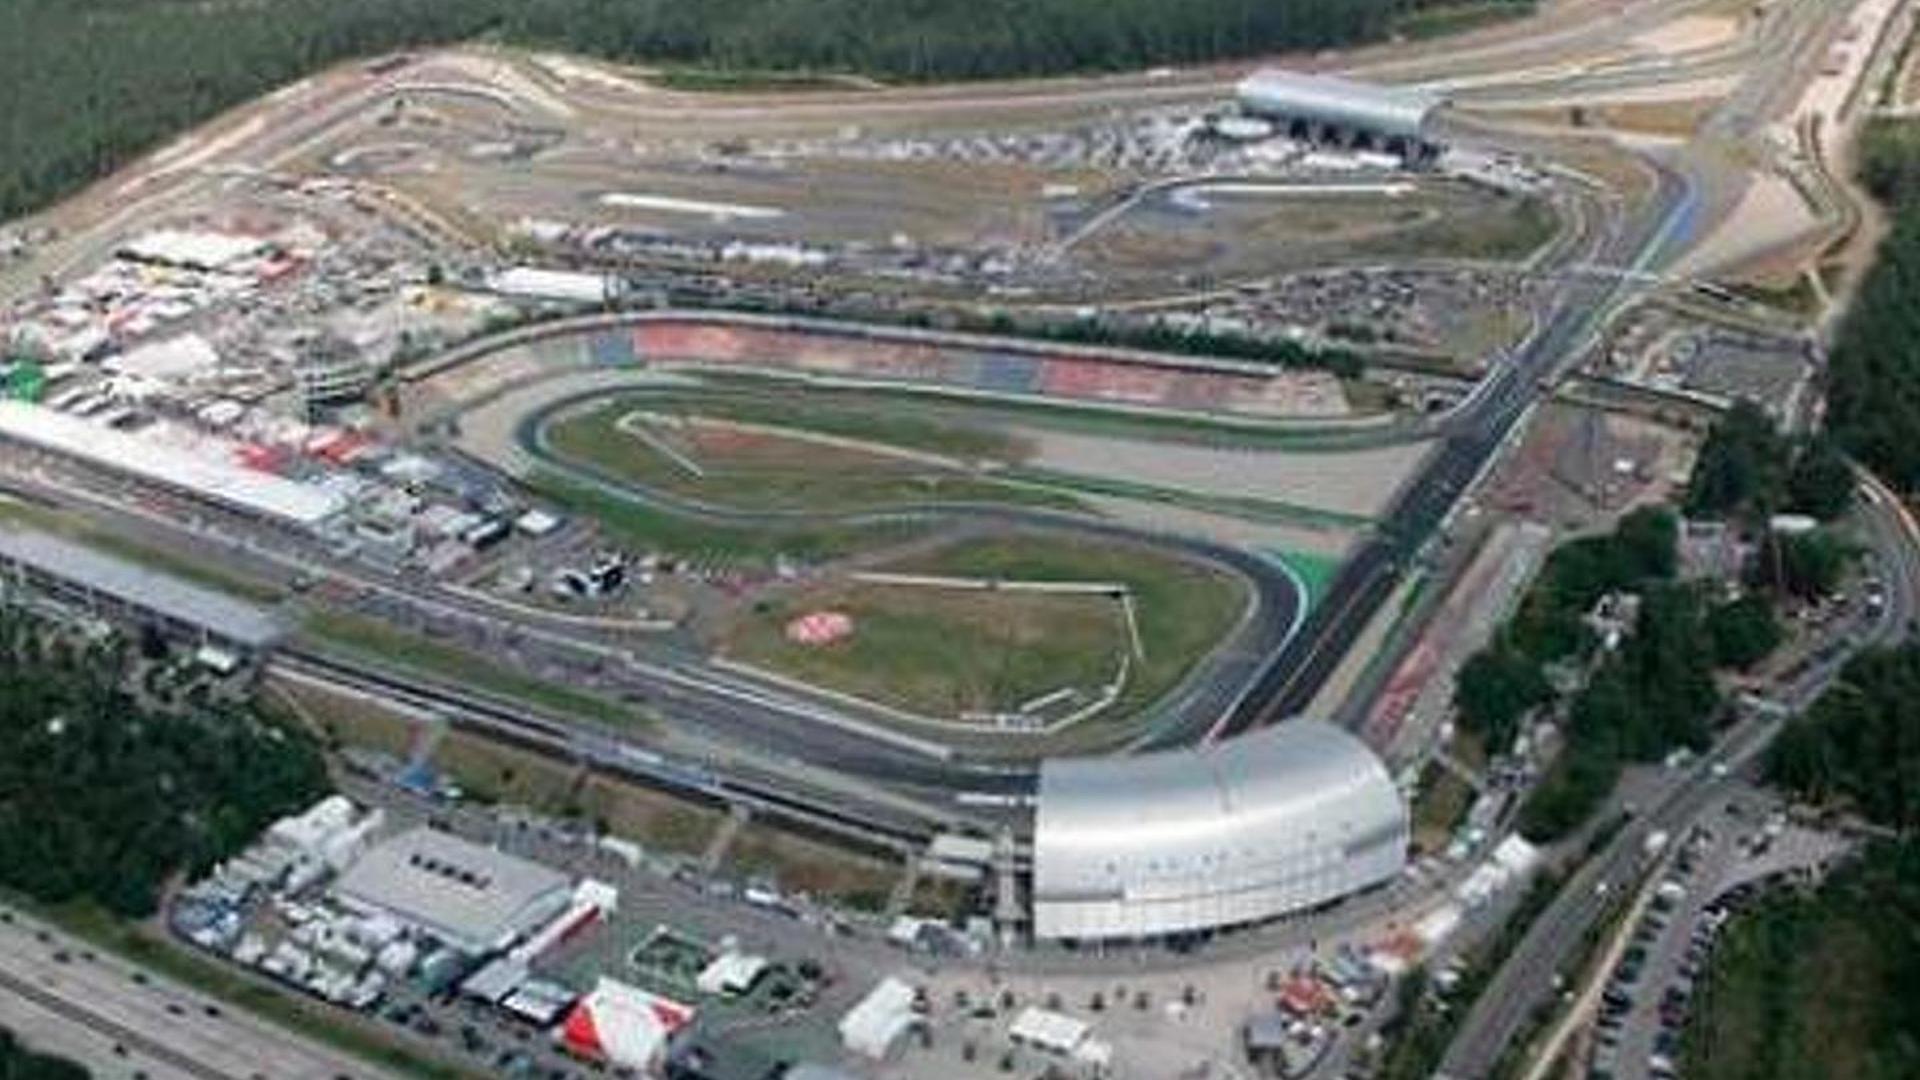 German GP demise not Ecclestone's fault - Lauda